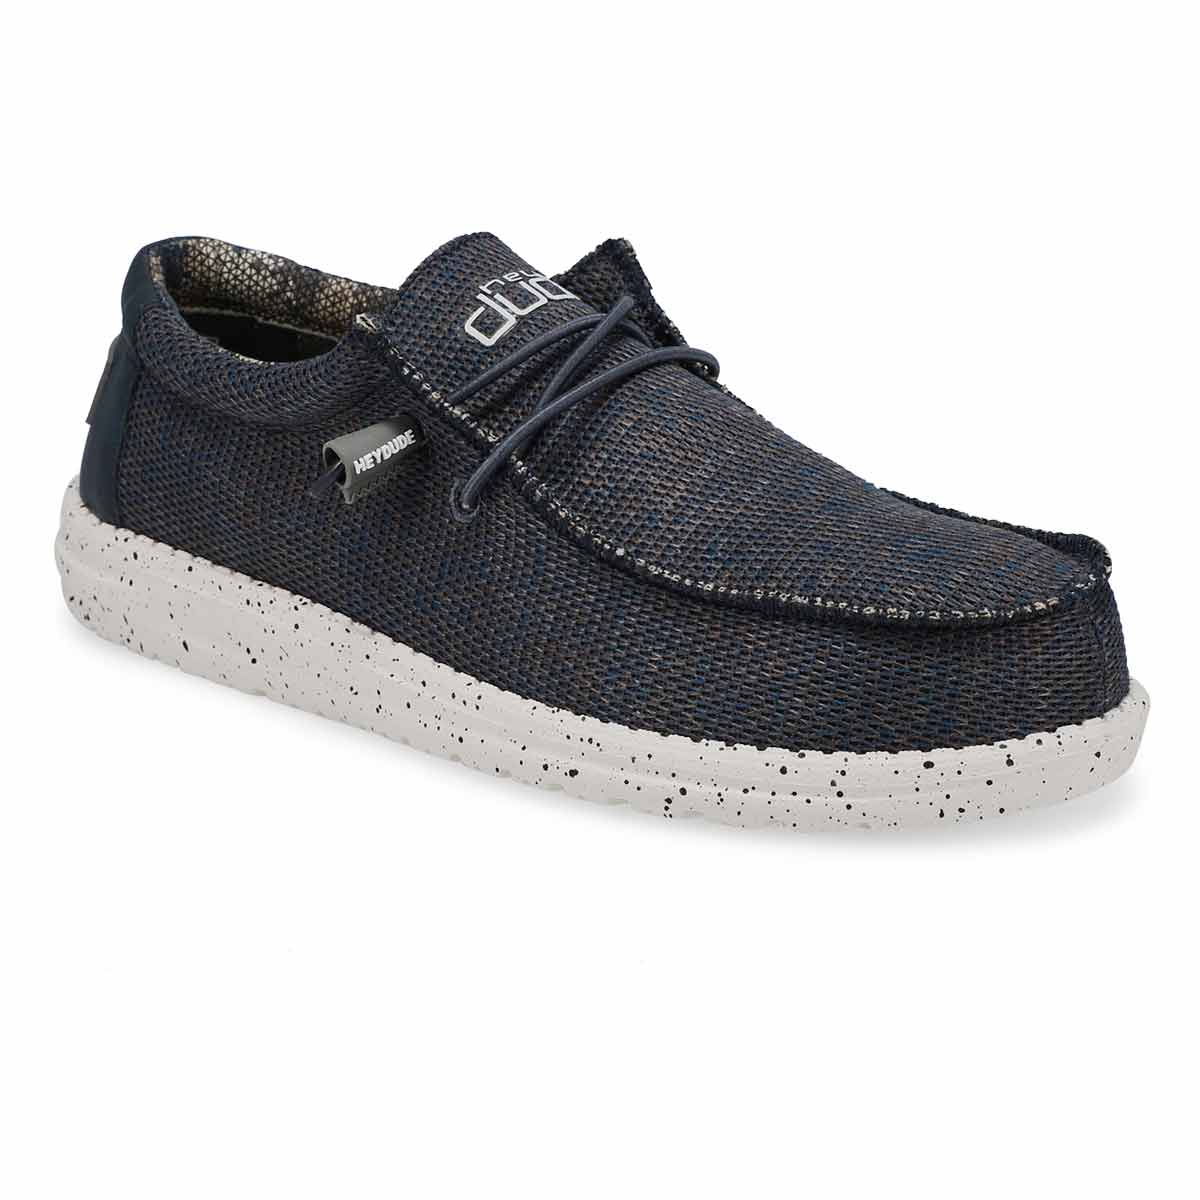 Men's Wally Sox Casual Shoe - Navy/Grey